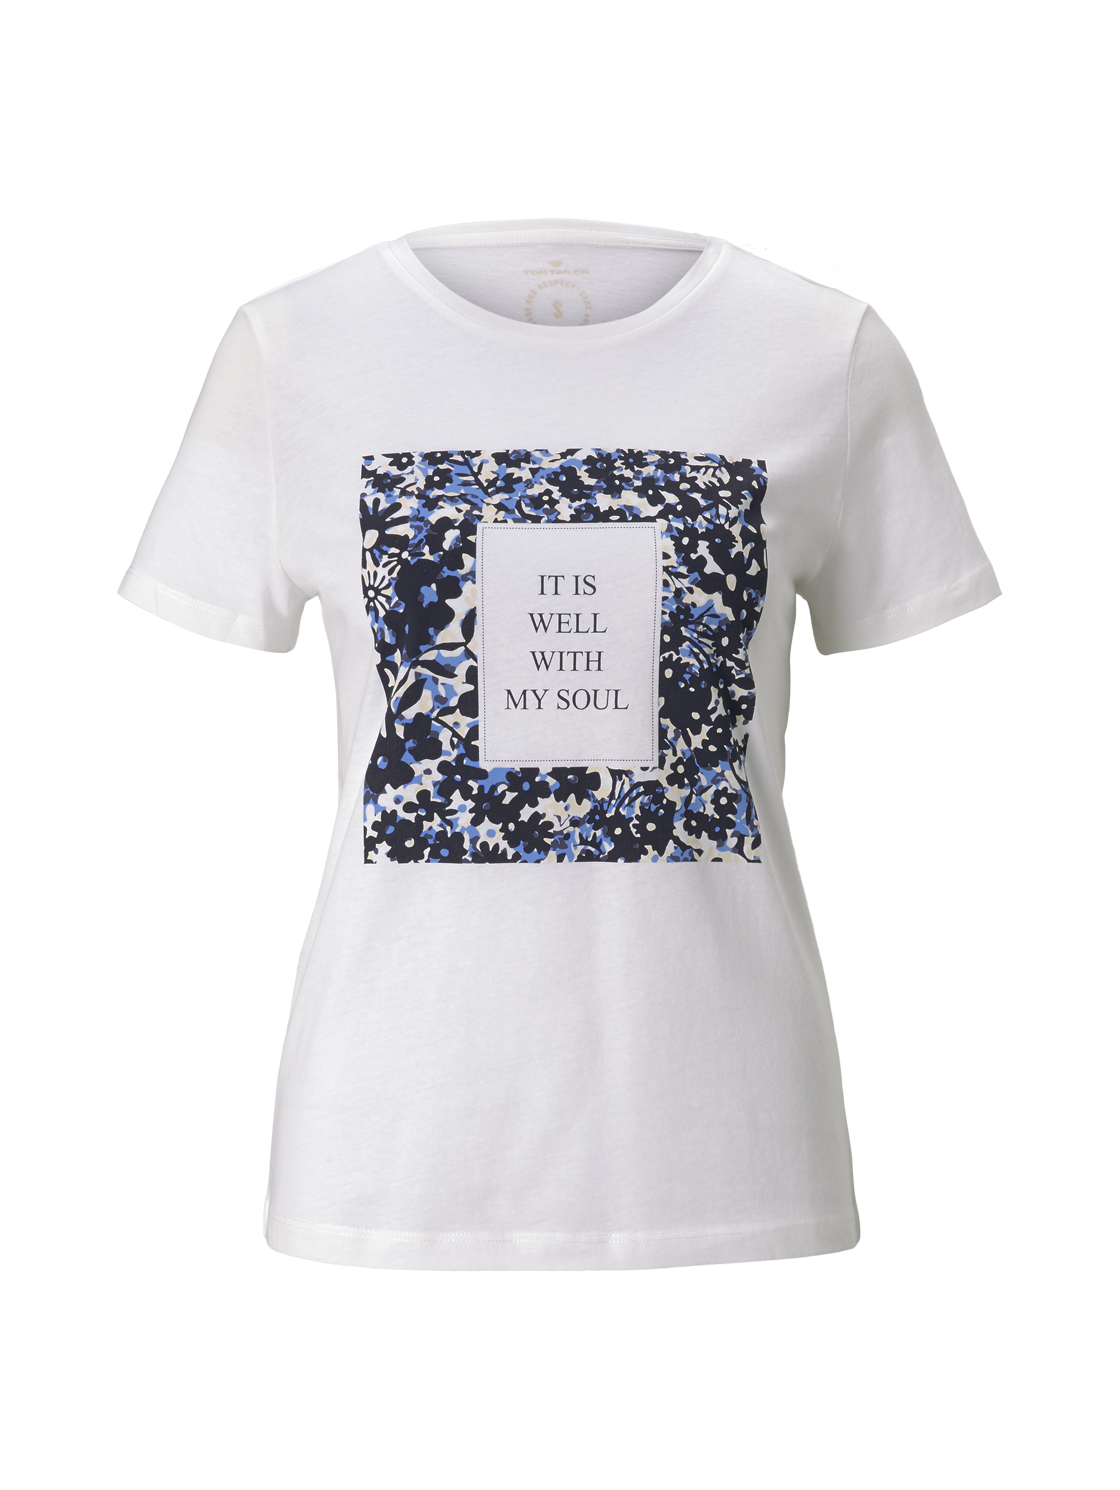 T-shirt crew neck print